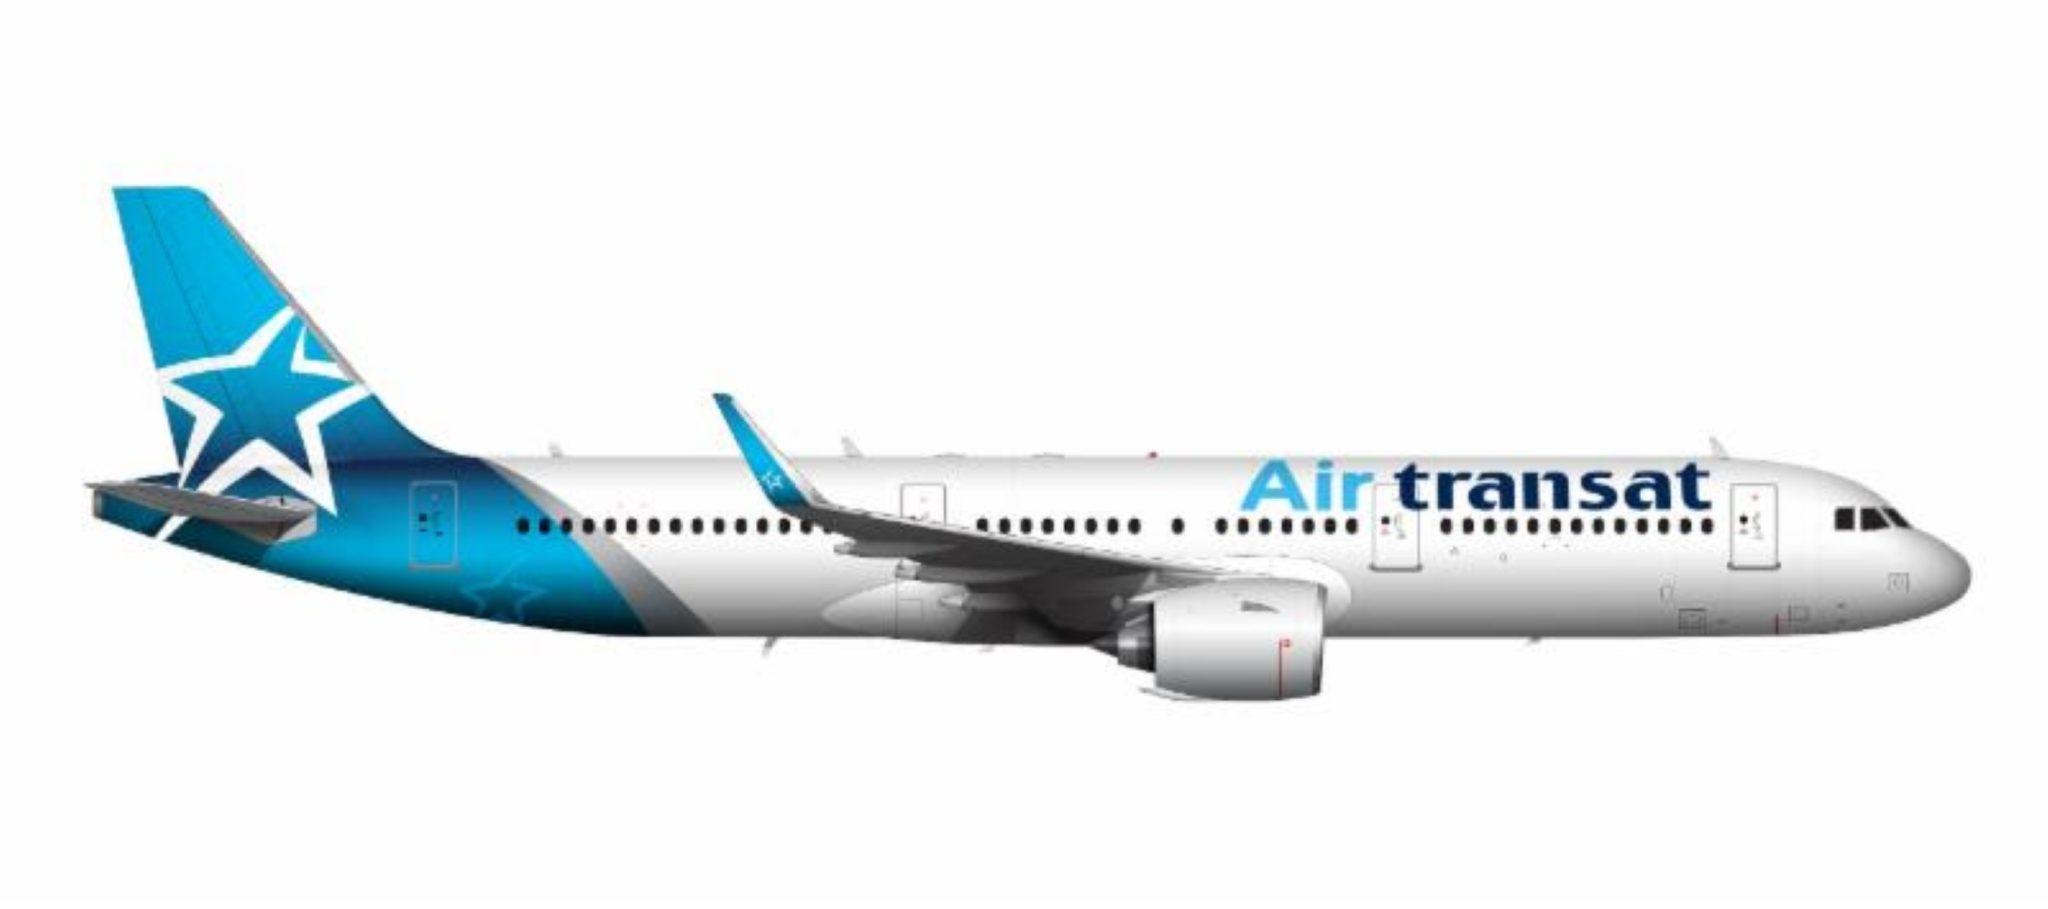 Press Release Bluebox Wow Flexes On Air Transat Runway Girlrunway